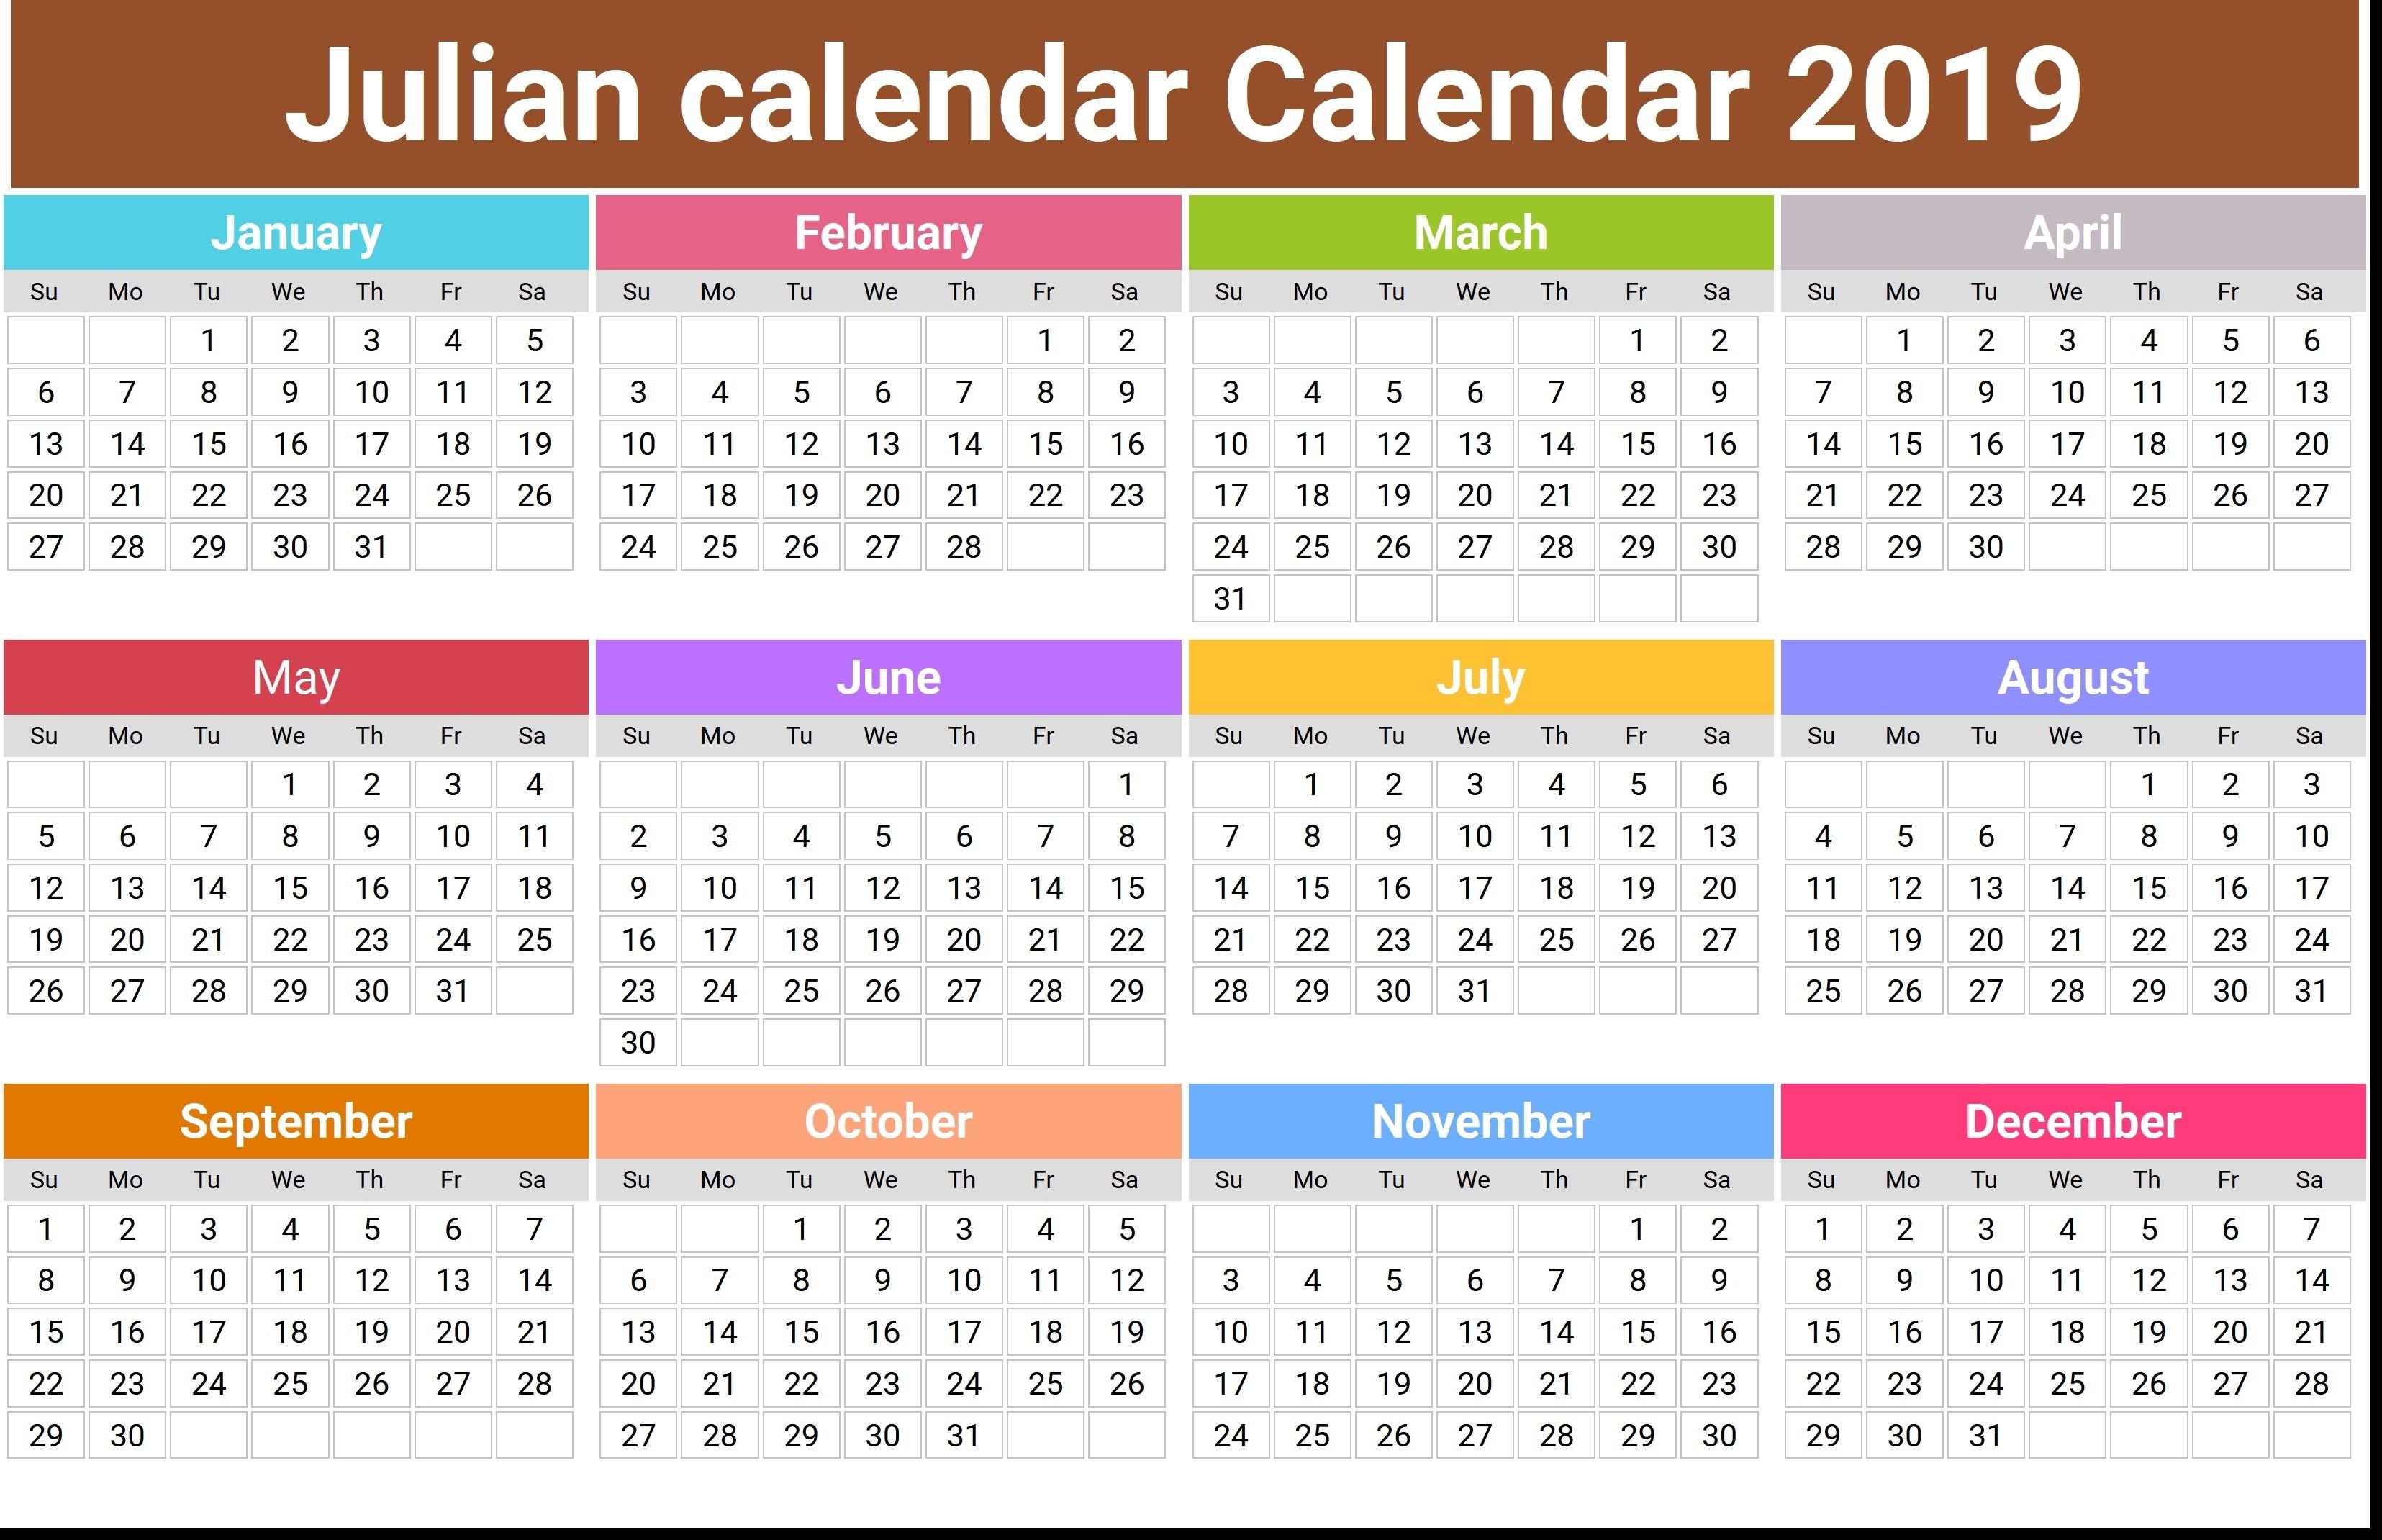 Julian Calendar 2020 2020 Template | Example Calendar Printable for Julian Calendar 2020 - Quadax